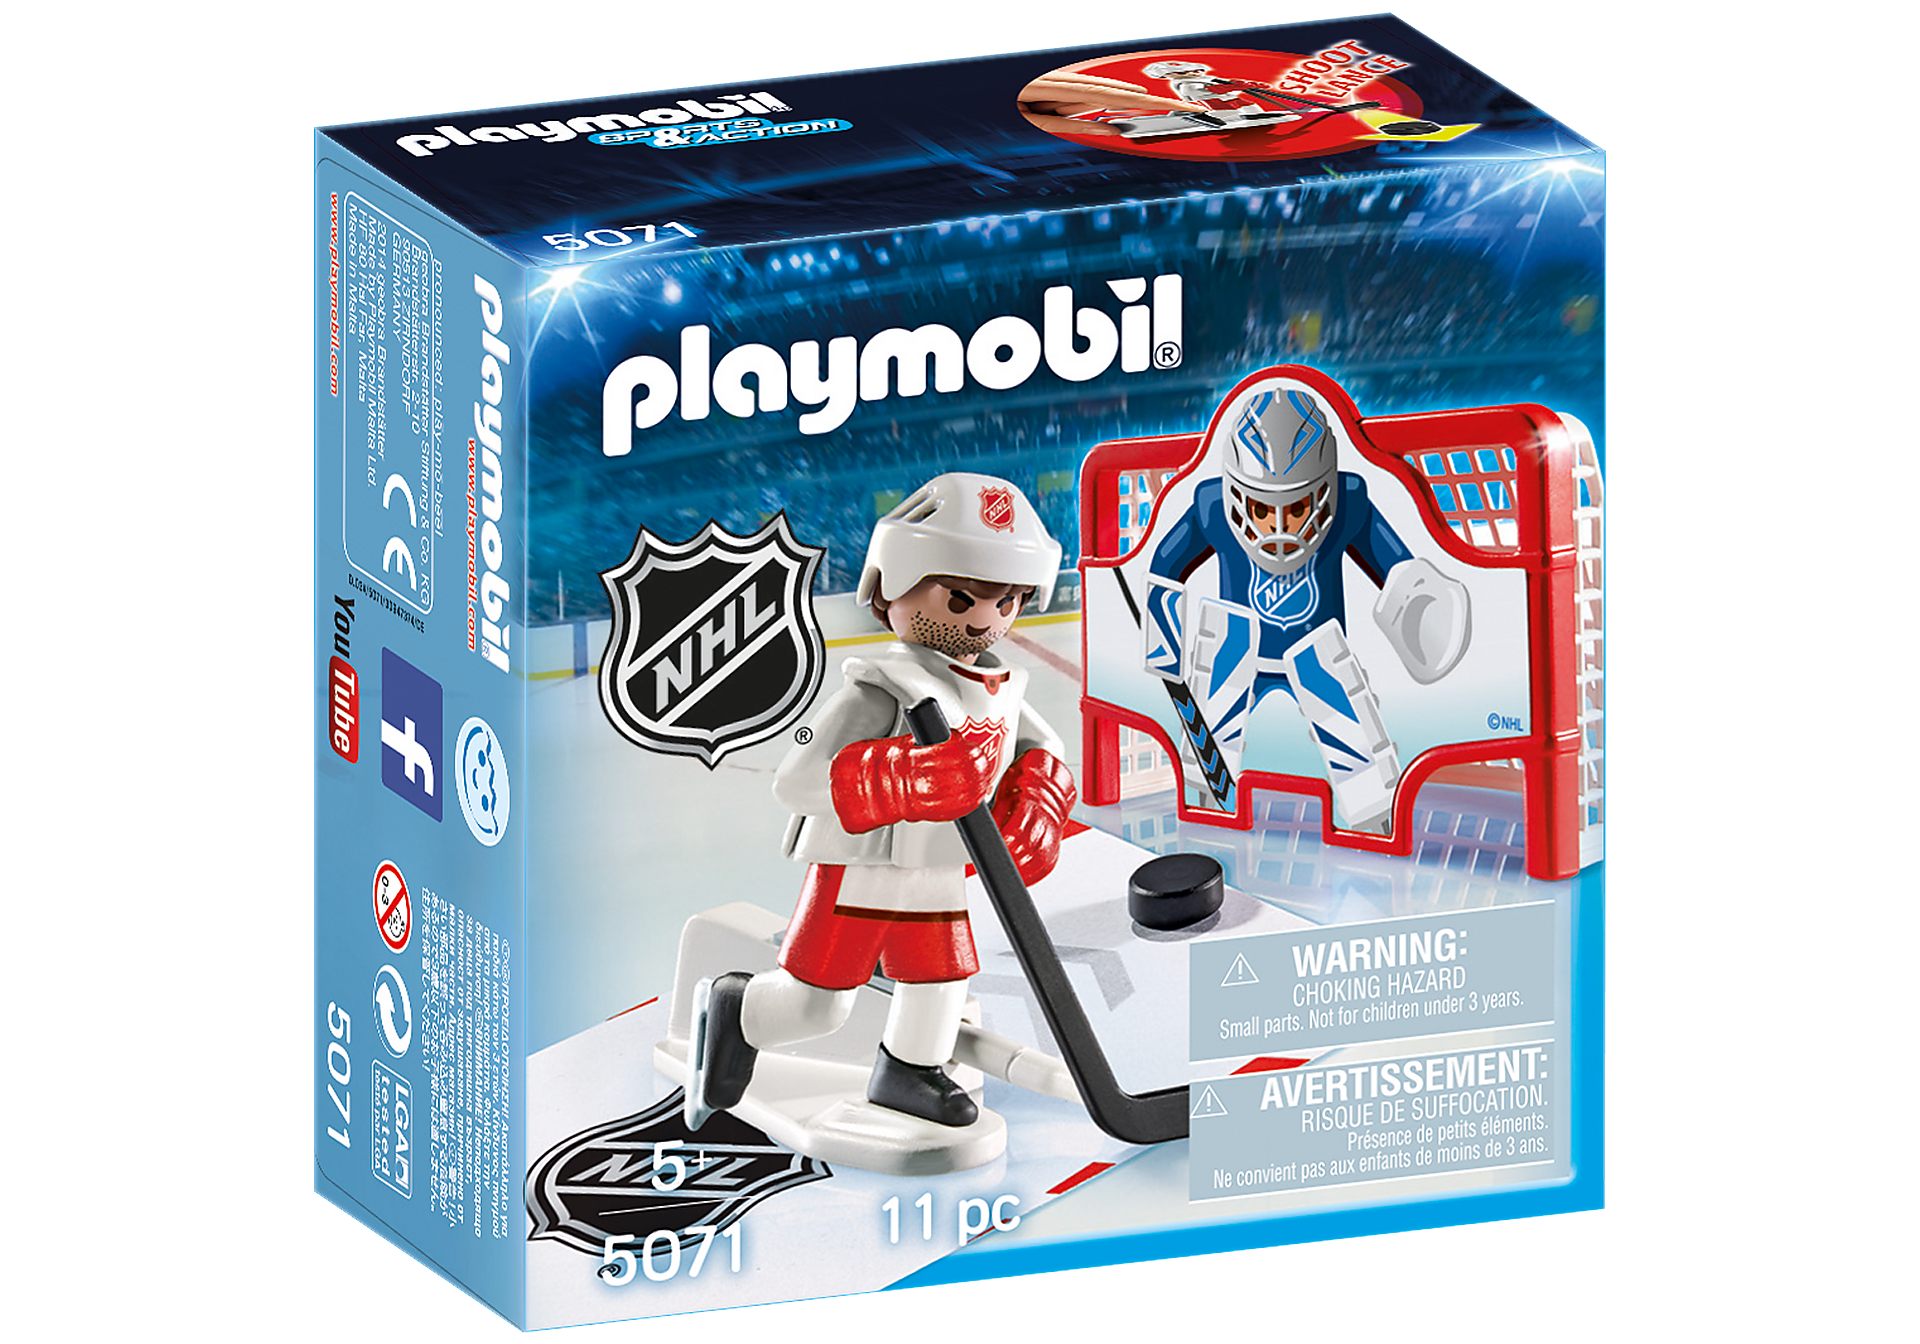 5071 NHL® Eishockey-Tortraining zoom image2